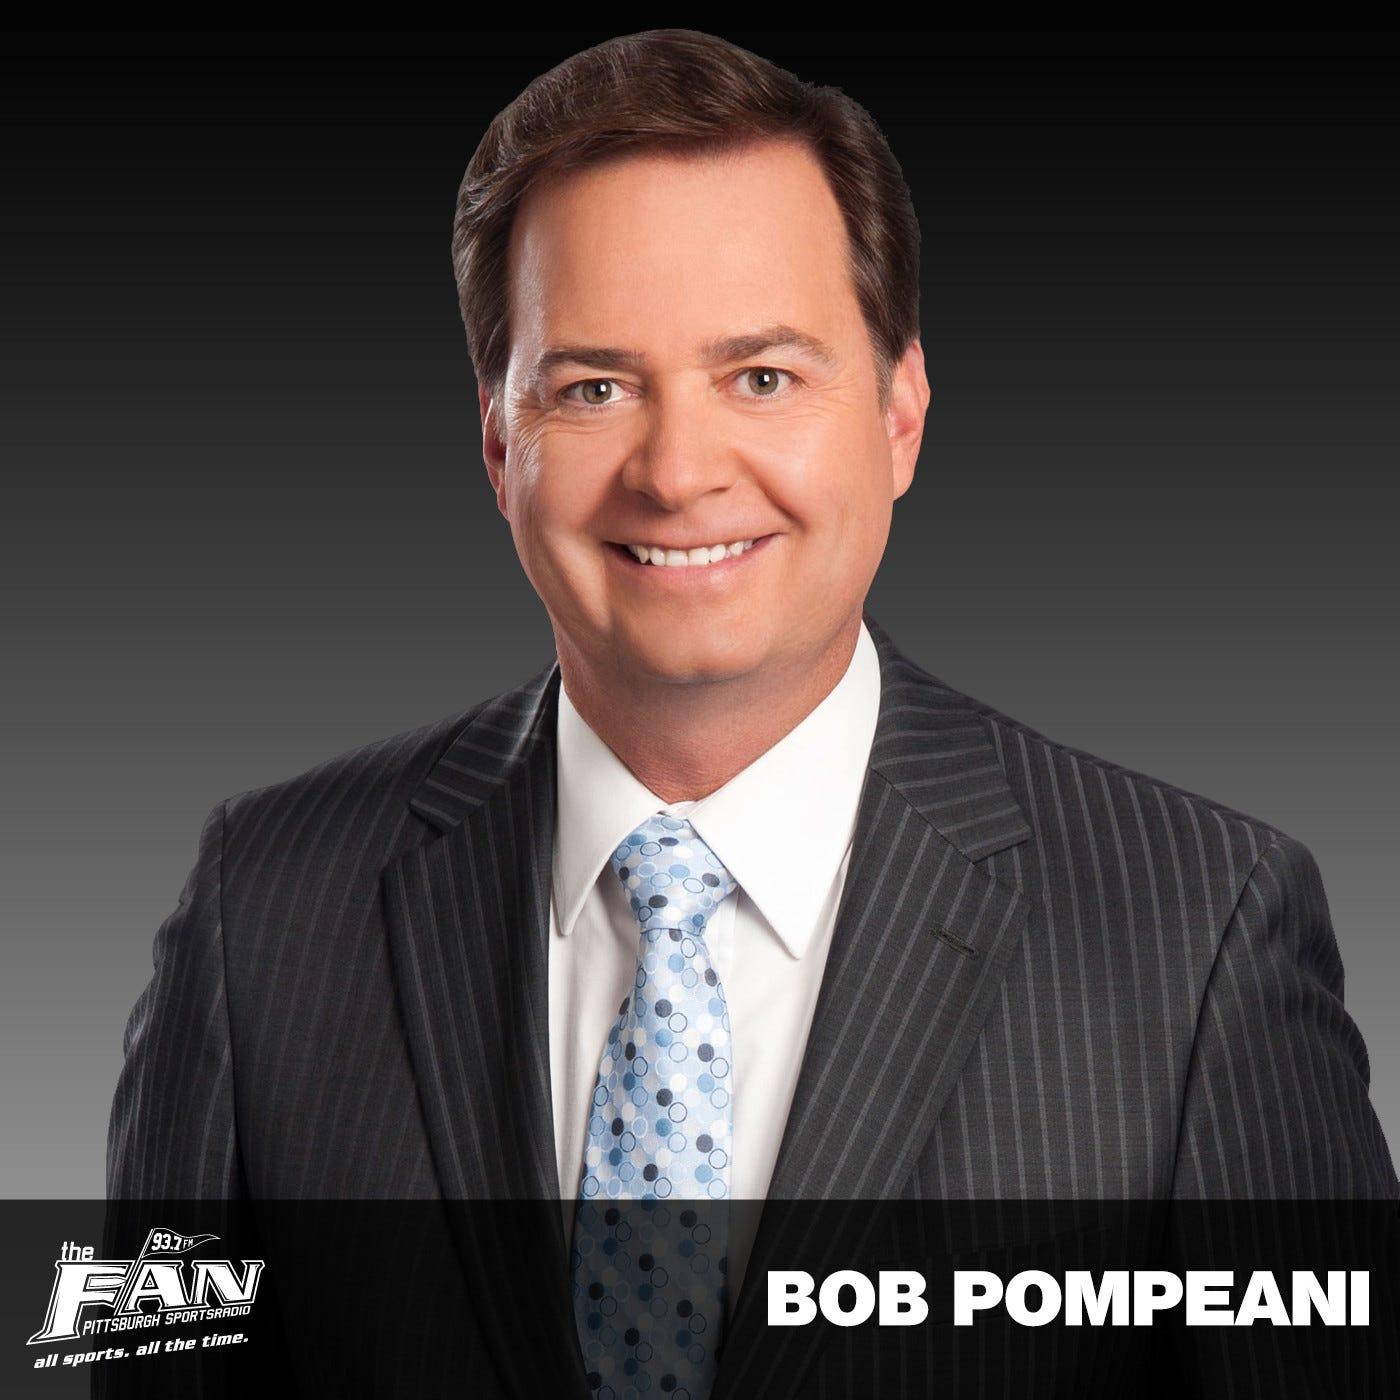 The Bob Pompeani Show